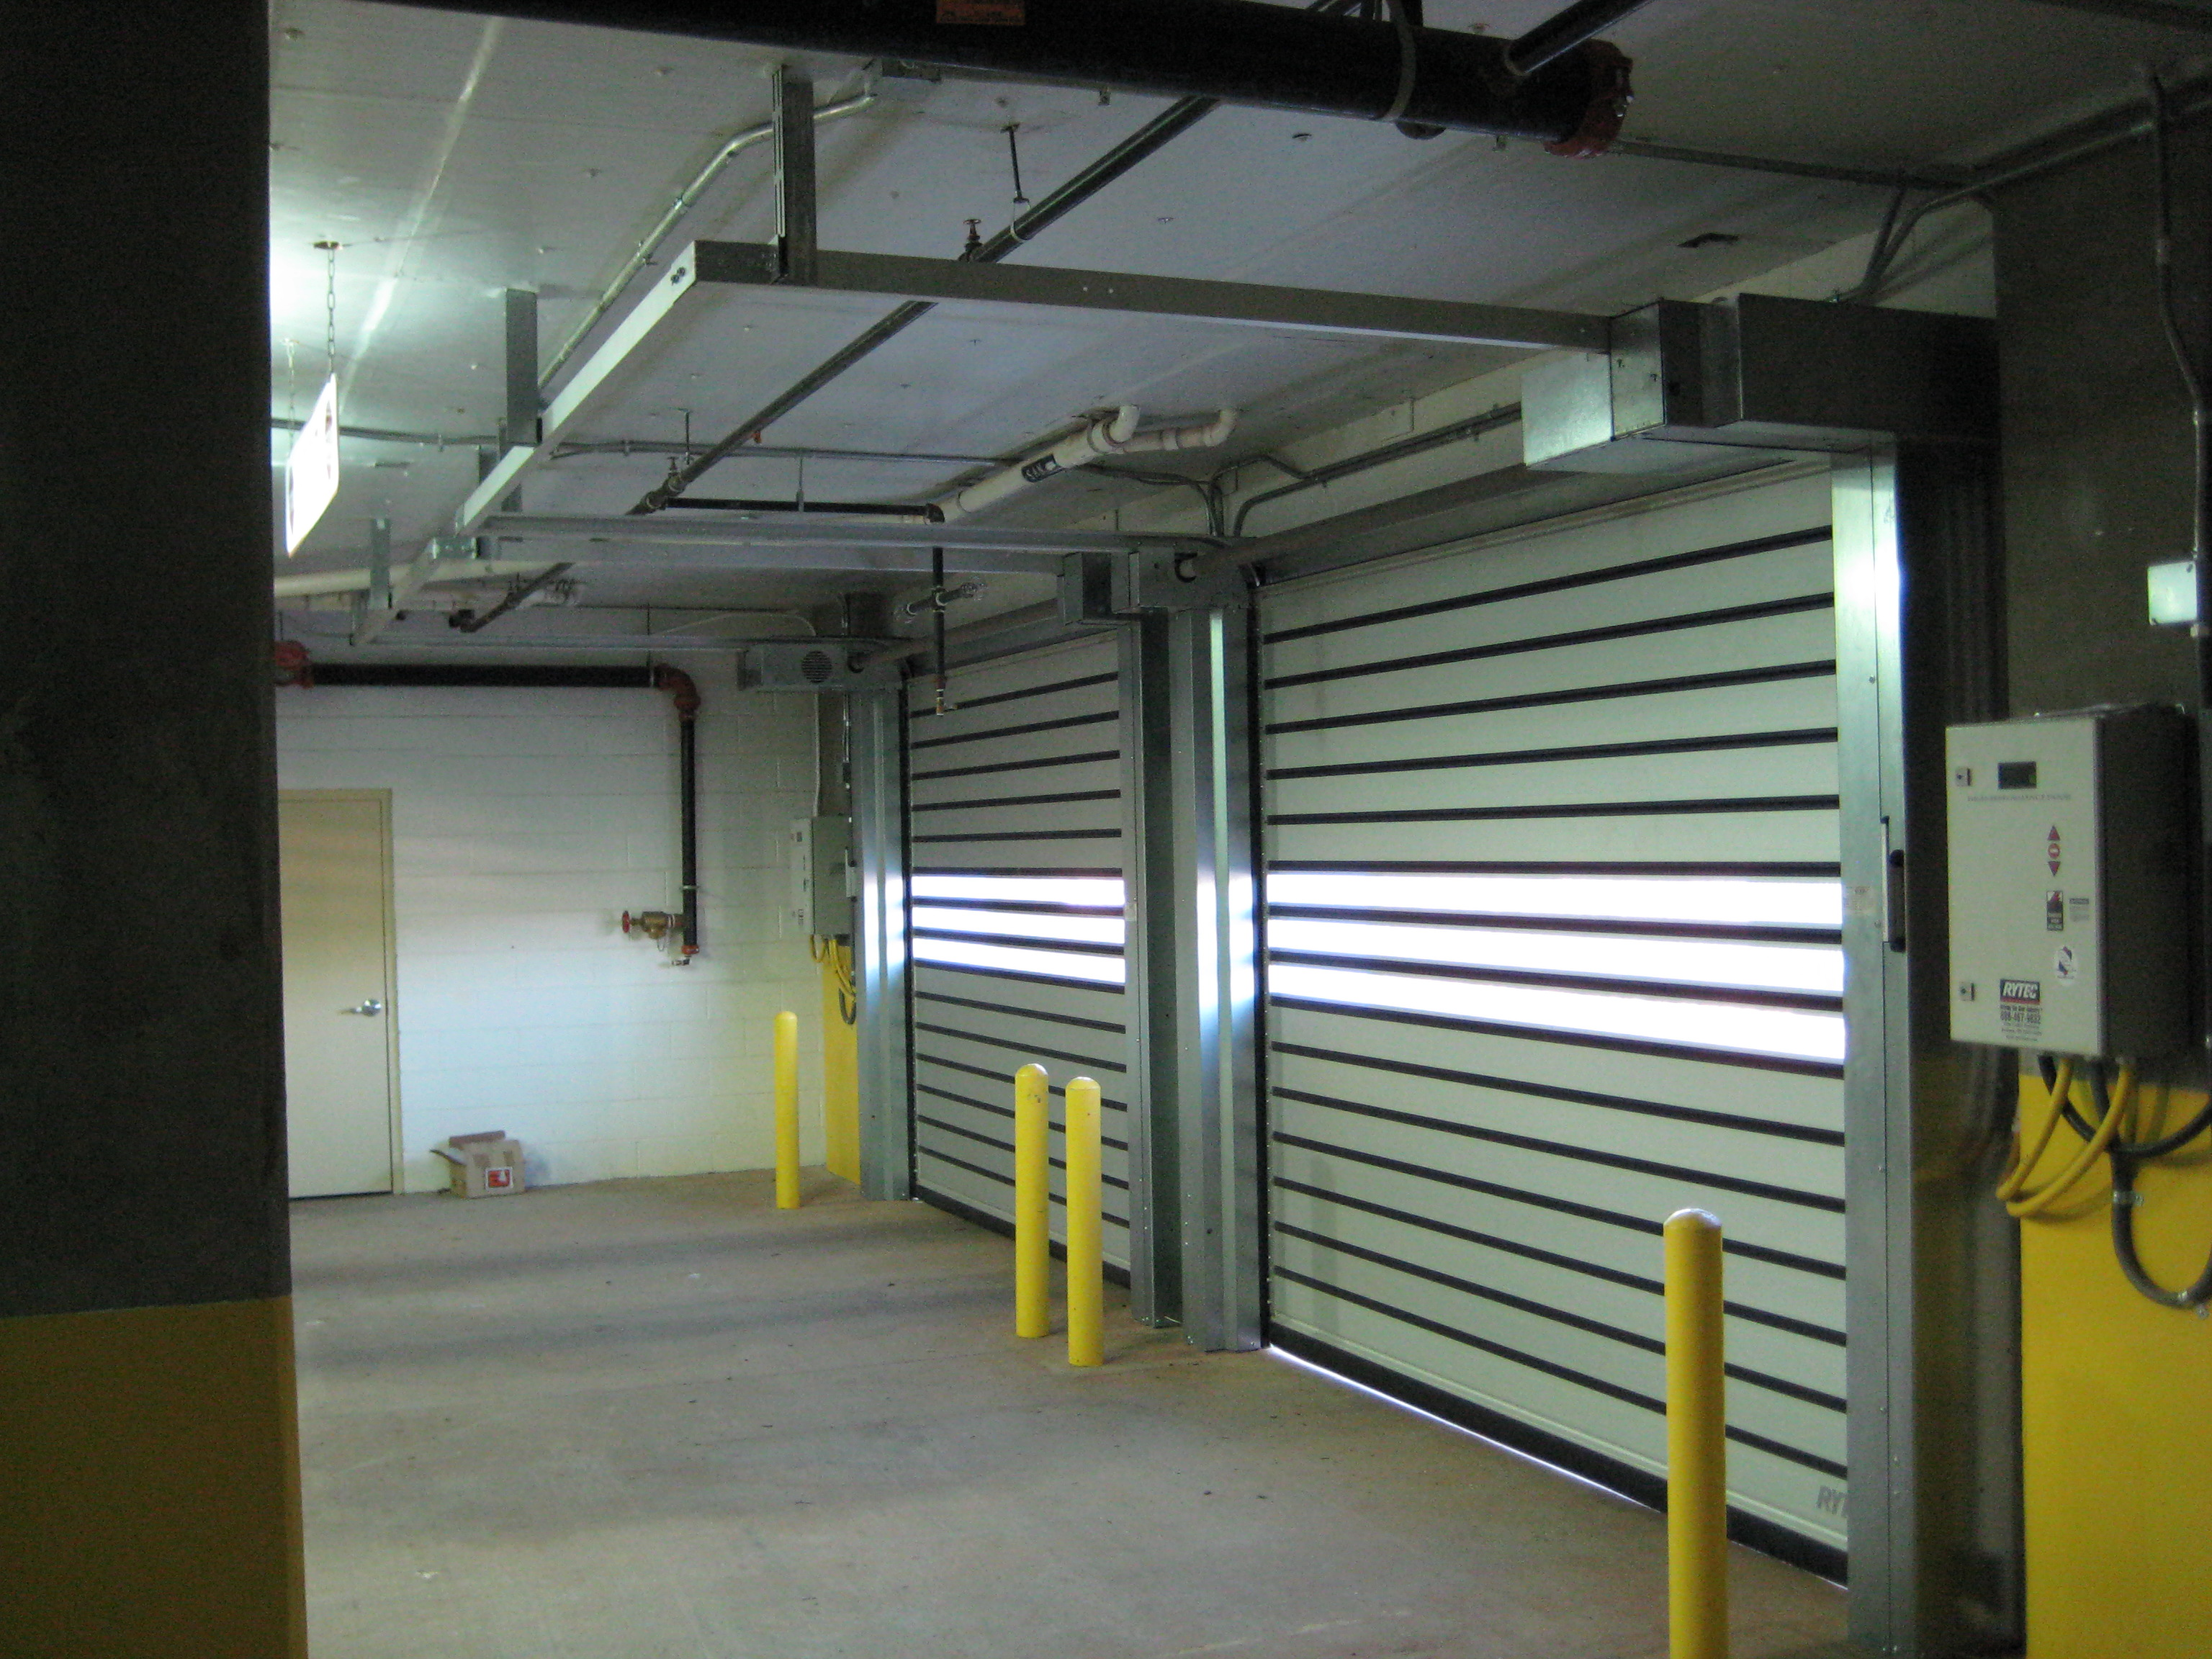 Low_headroom_clearance_garage_door_rolling_gate_NJ_NYC_high_speed_rytec  Rytec_Low_Head_Room_Coiling_Door